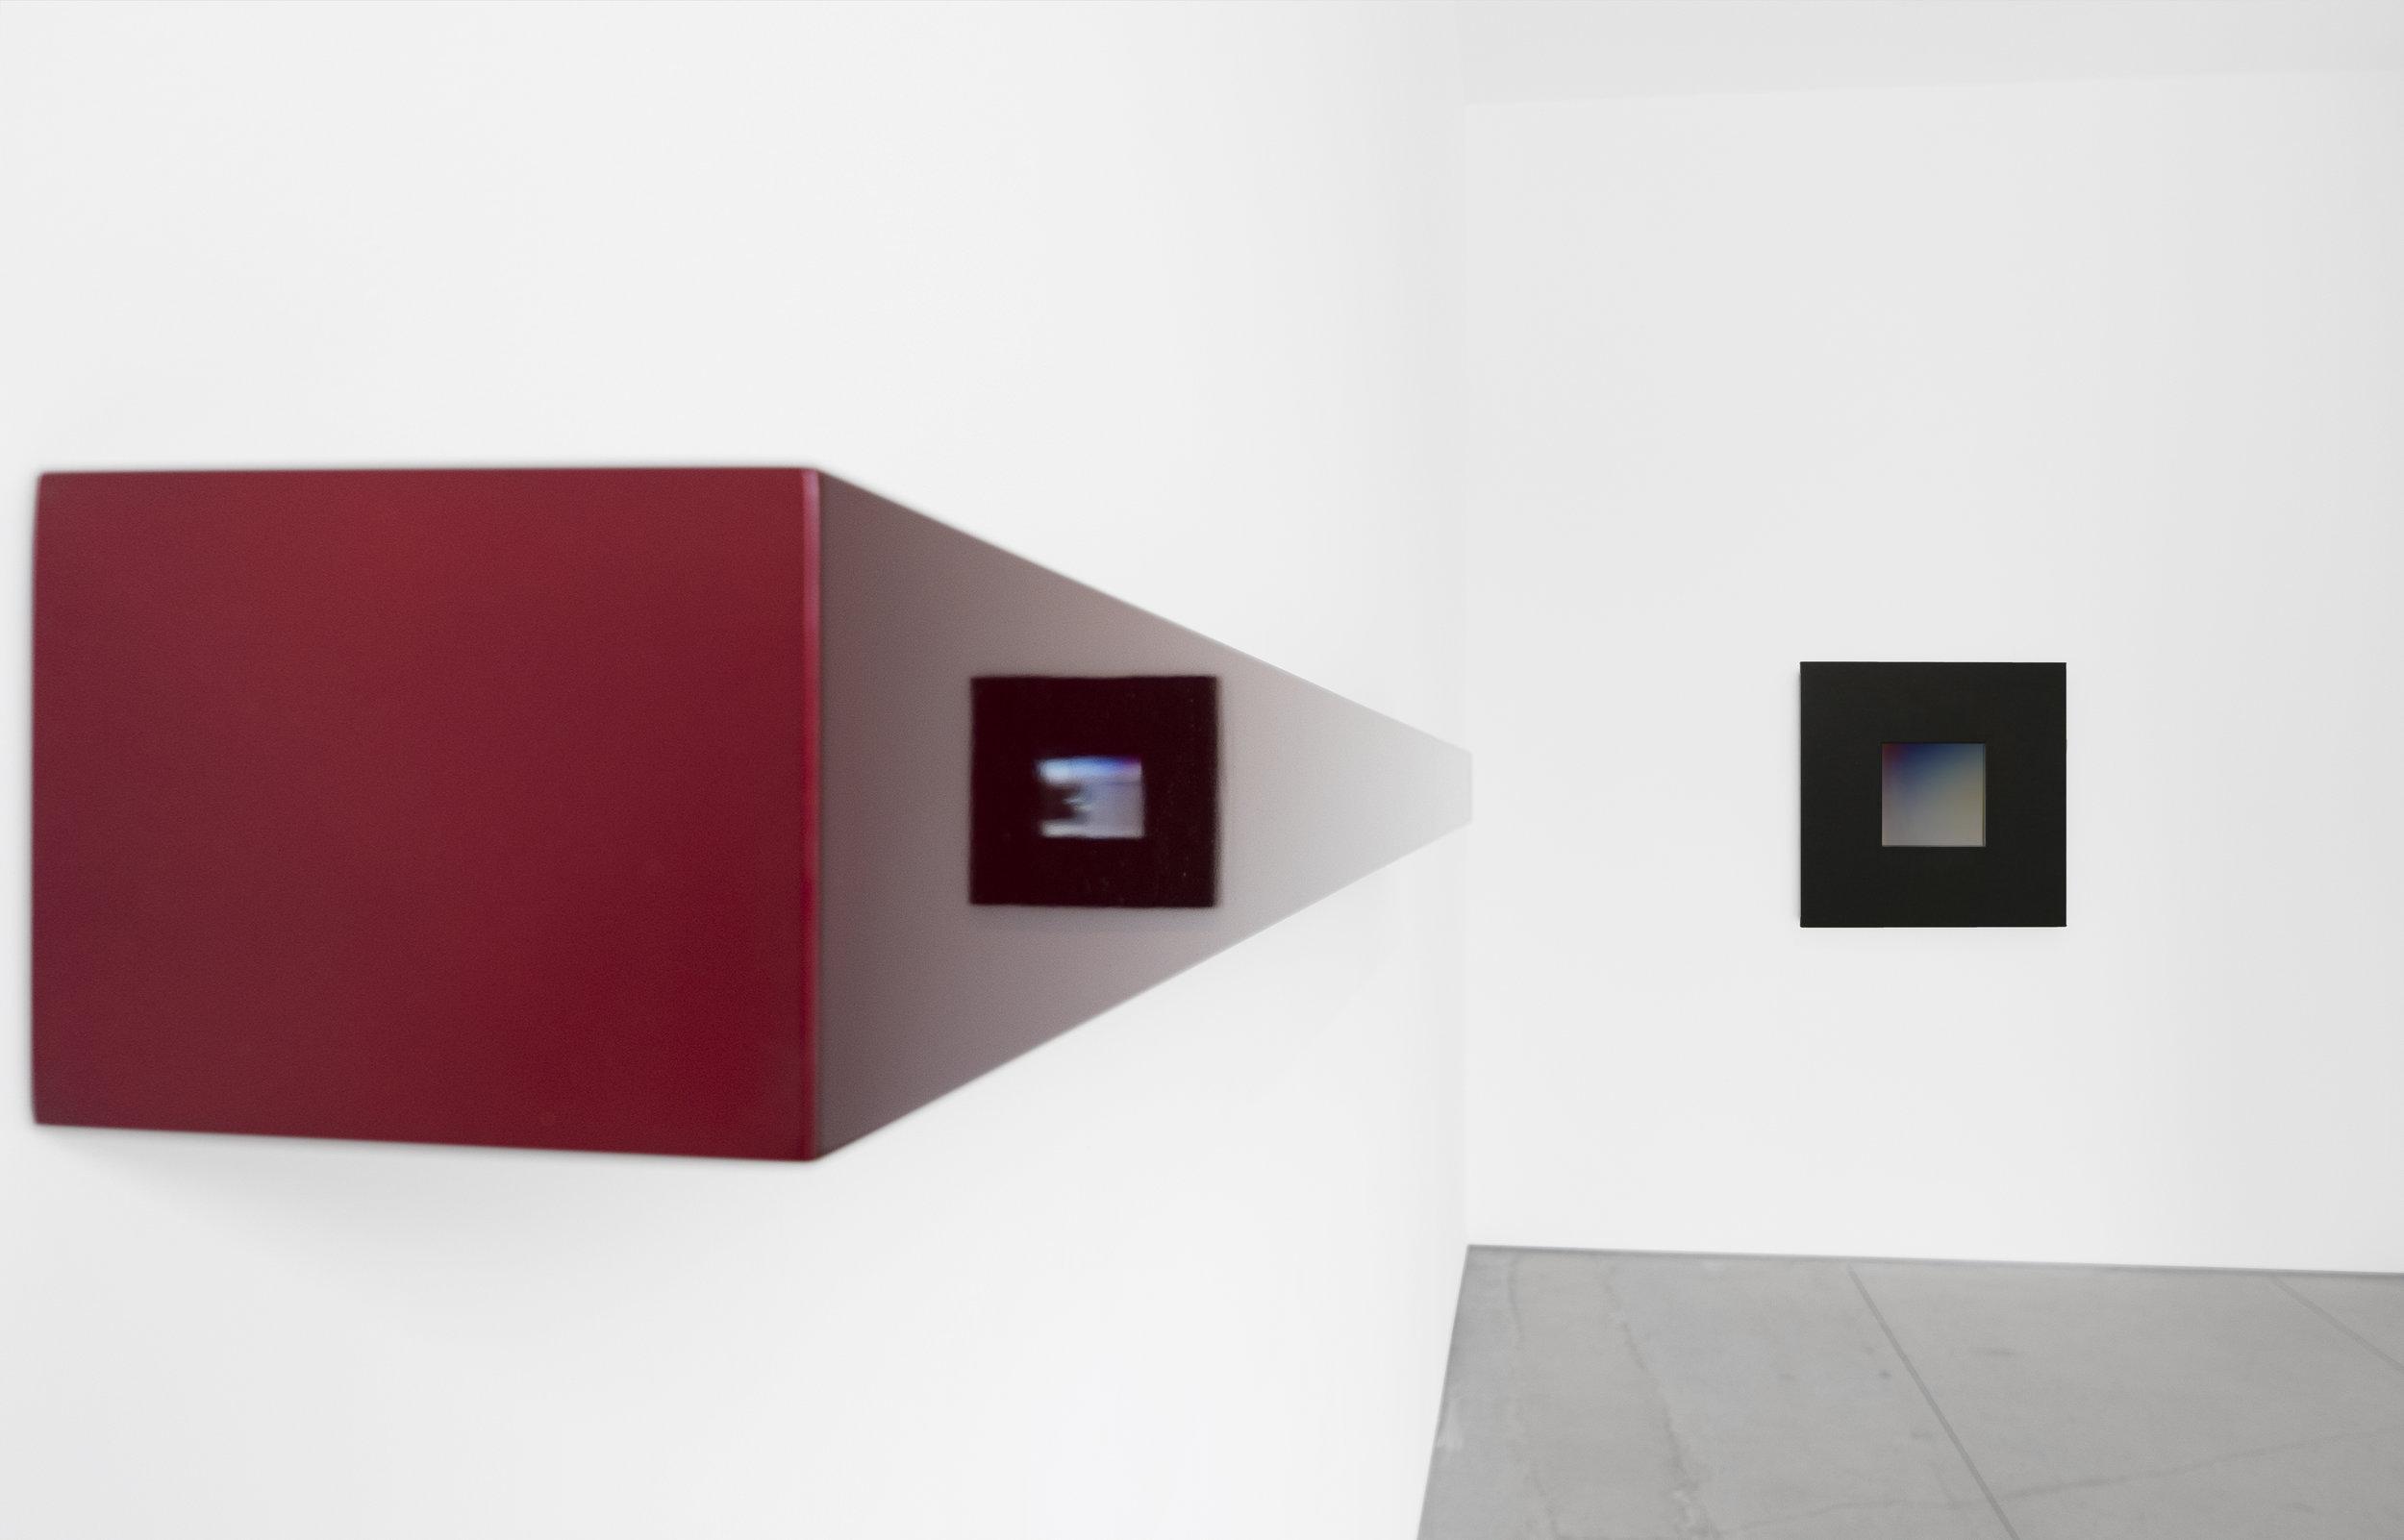 25 Years_Peter Blake Gallery_2019_Installation View_11.jpg